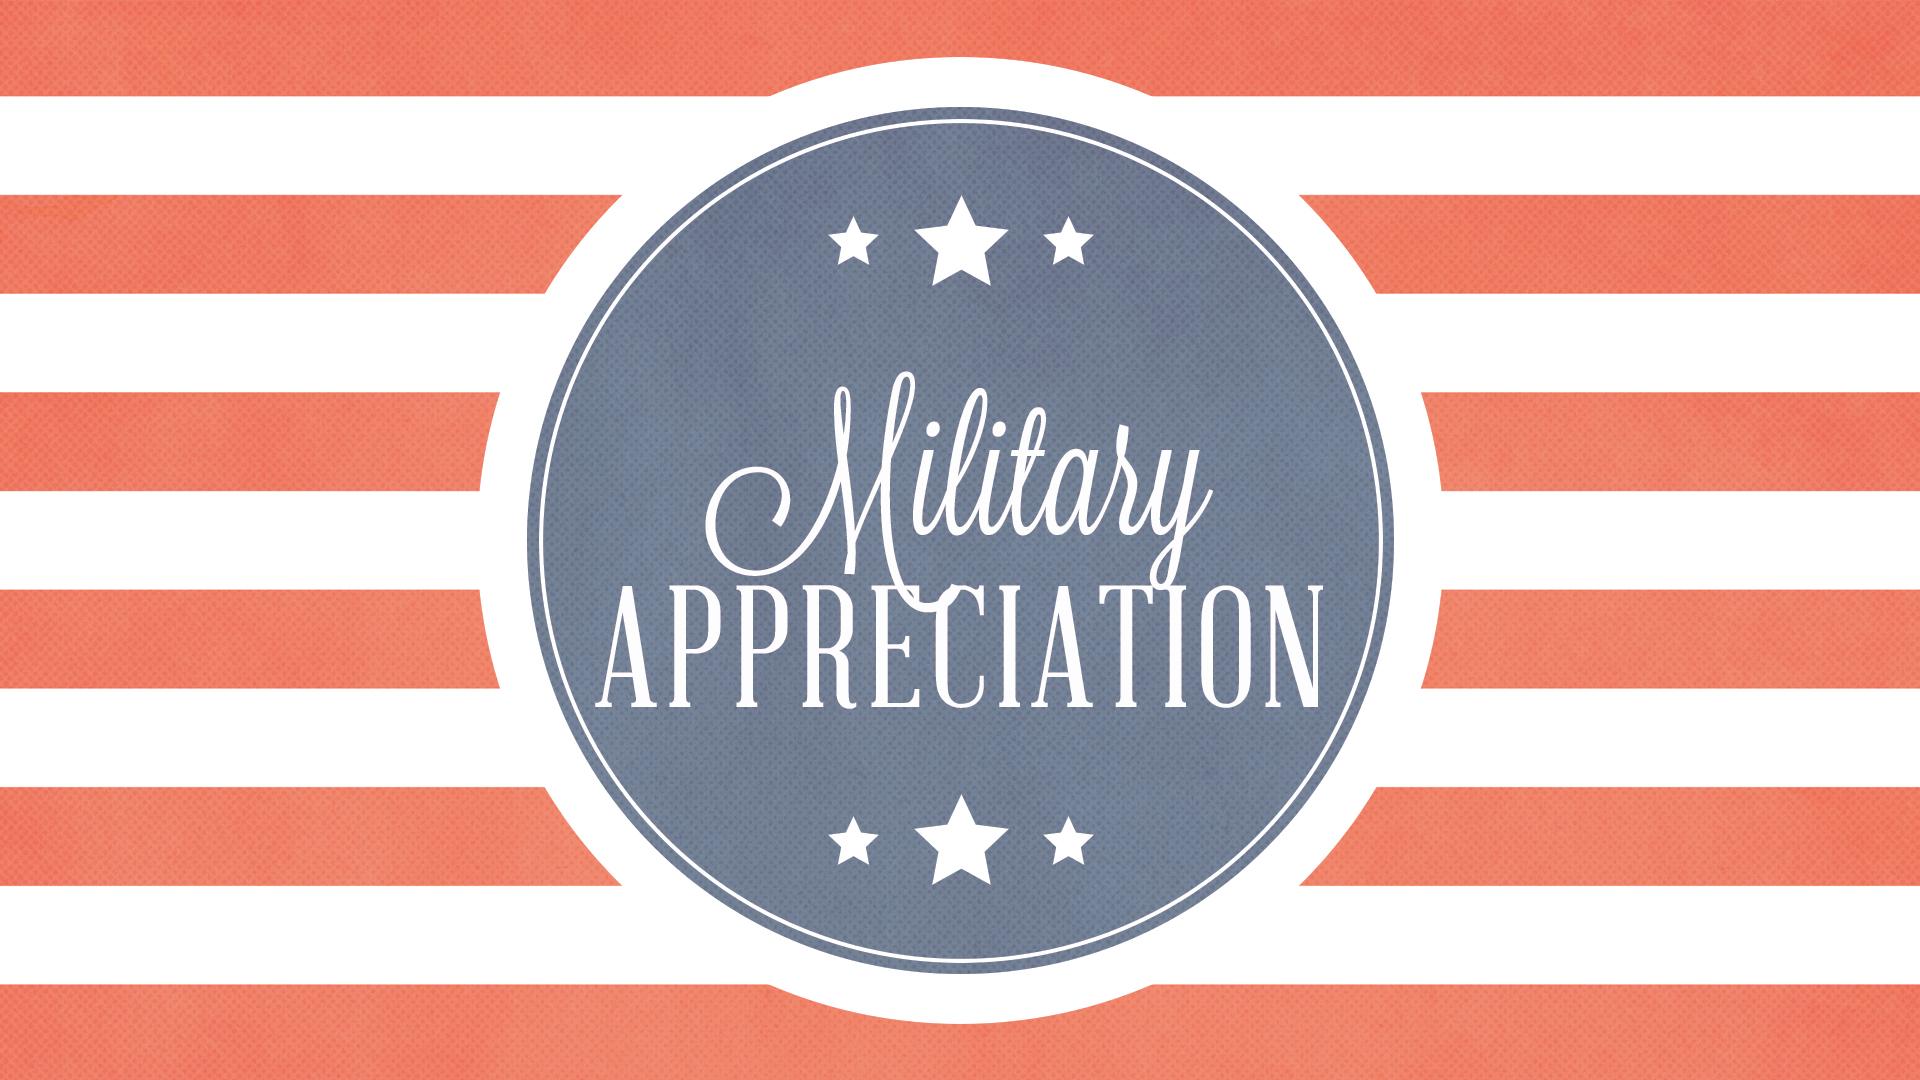 Military Appreciation.jpg